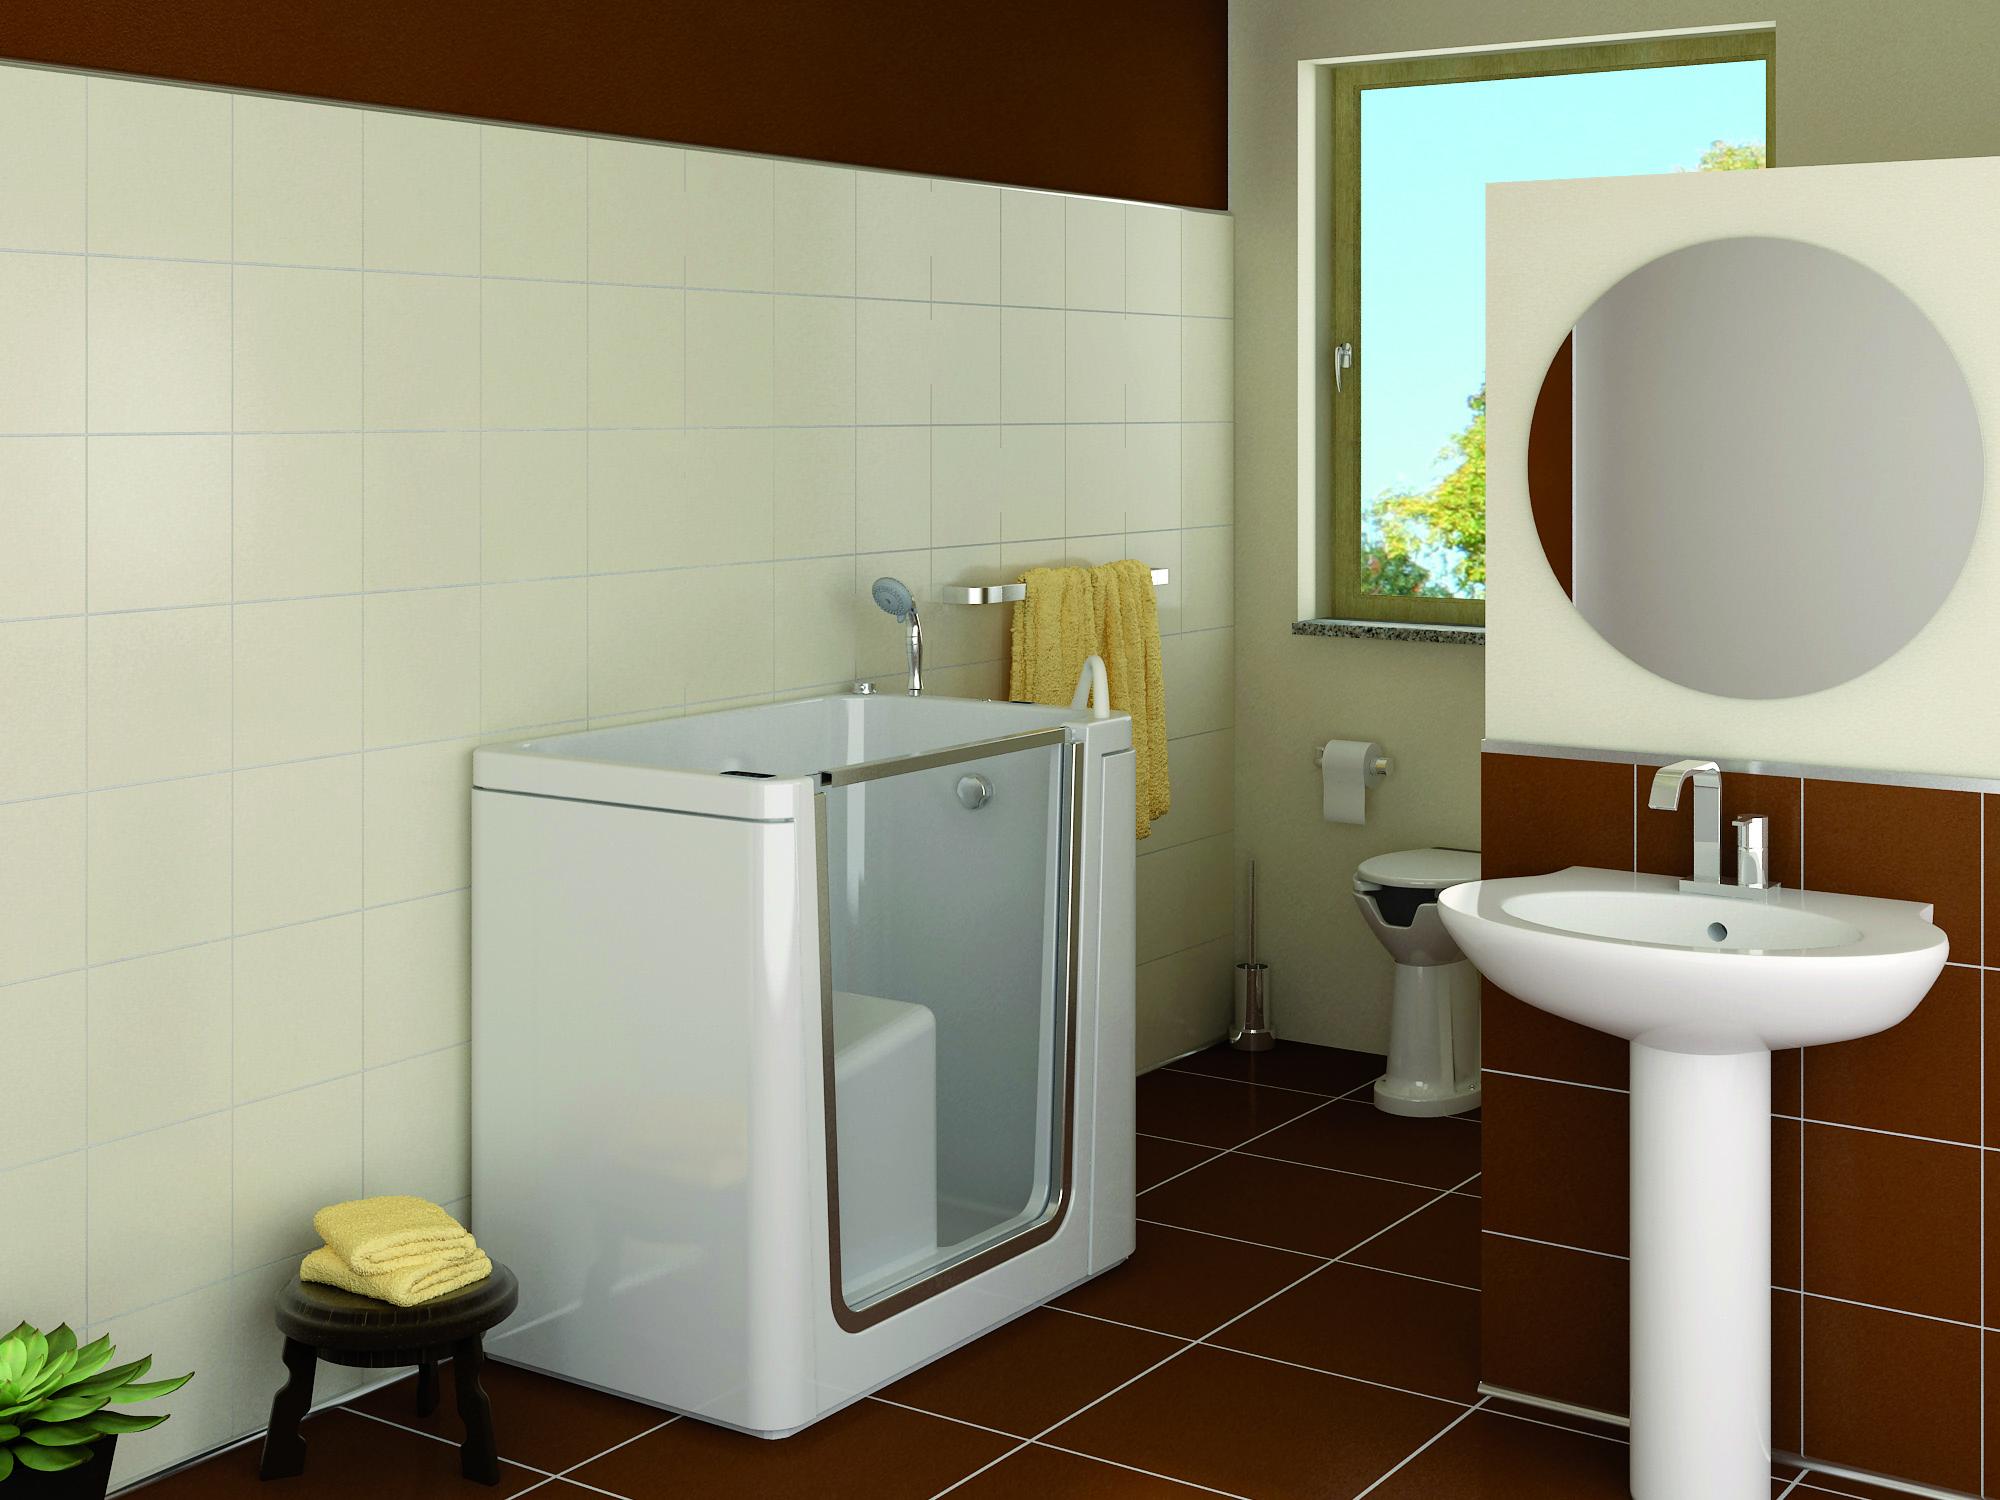 Vasche ad angolo prezzi vasca da bagno con piedini shropshire x cm bianco with vasche ad angolo - Vasca da bagno con sportello prezzo ...